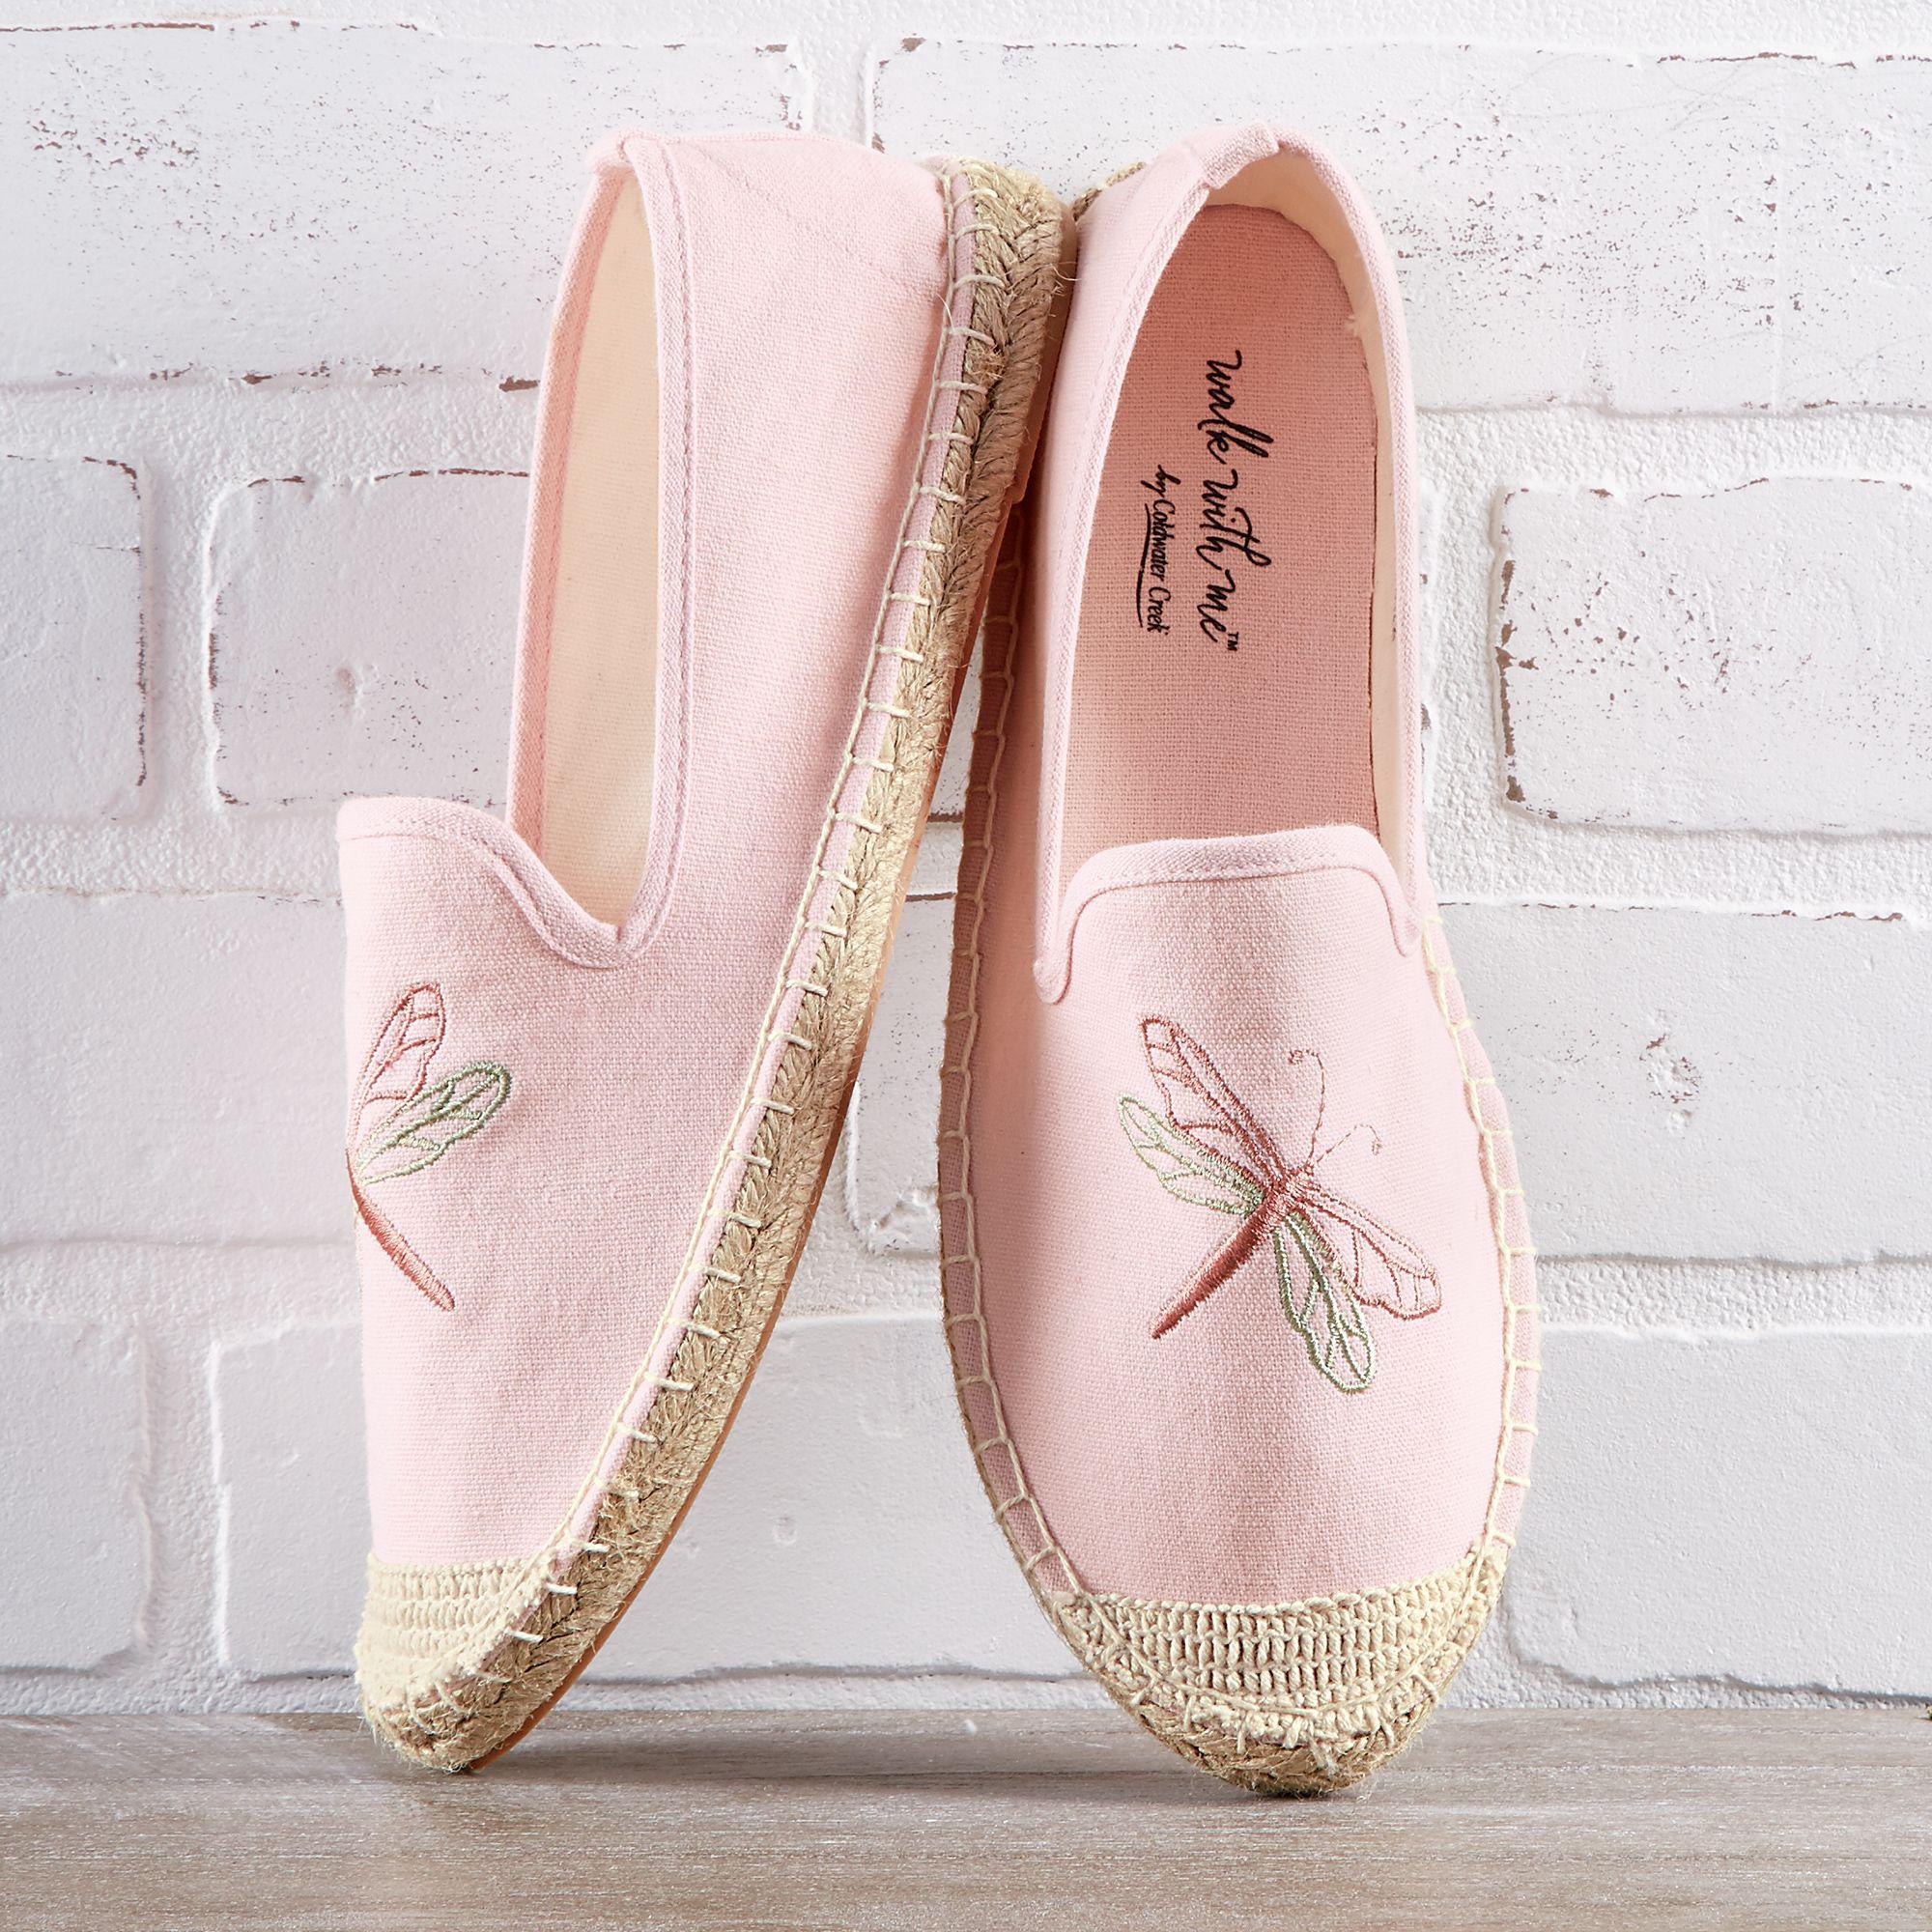 Walk in my shoes, Women shoes, Shoe style